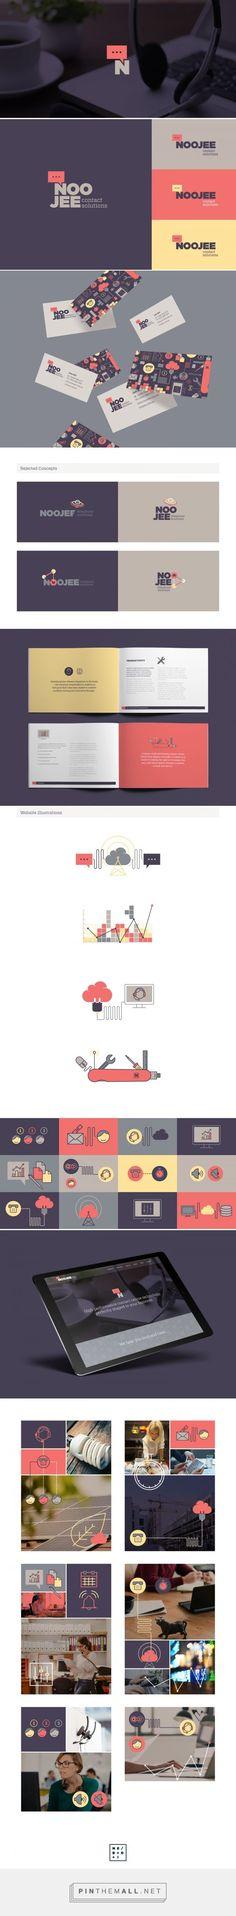 Noojee Branding by Nick Edlin on Behance   Fivestar Branding – Design and Branding Agency & Inspiration Gallery